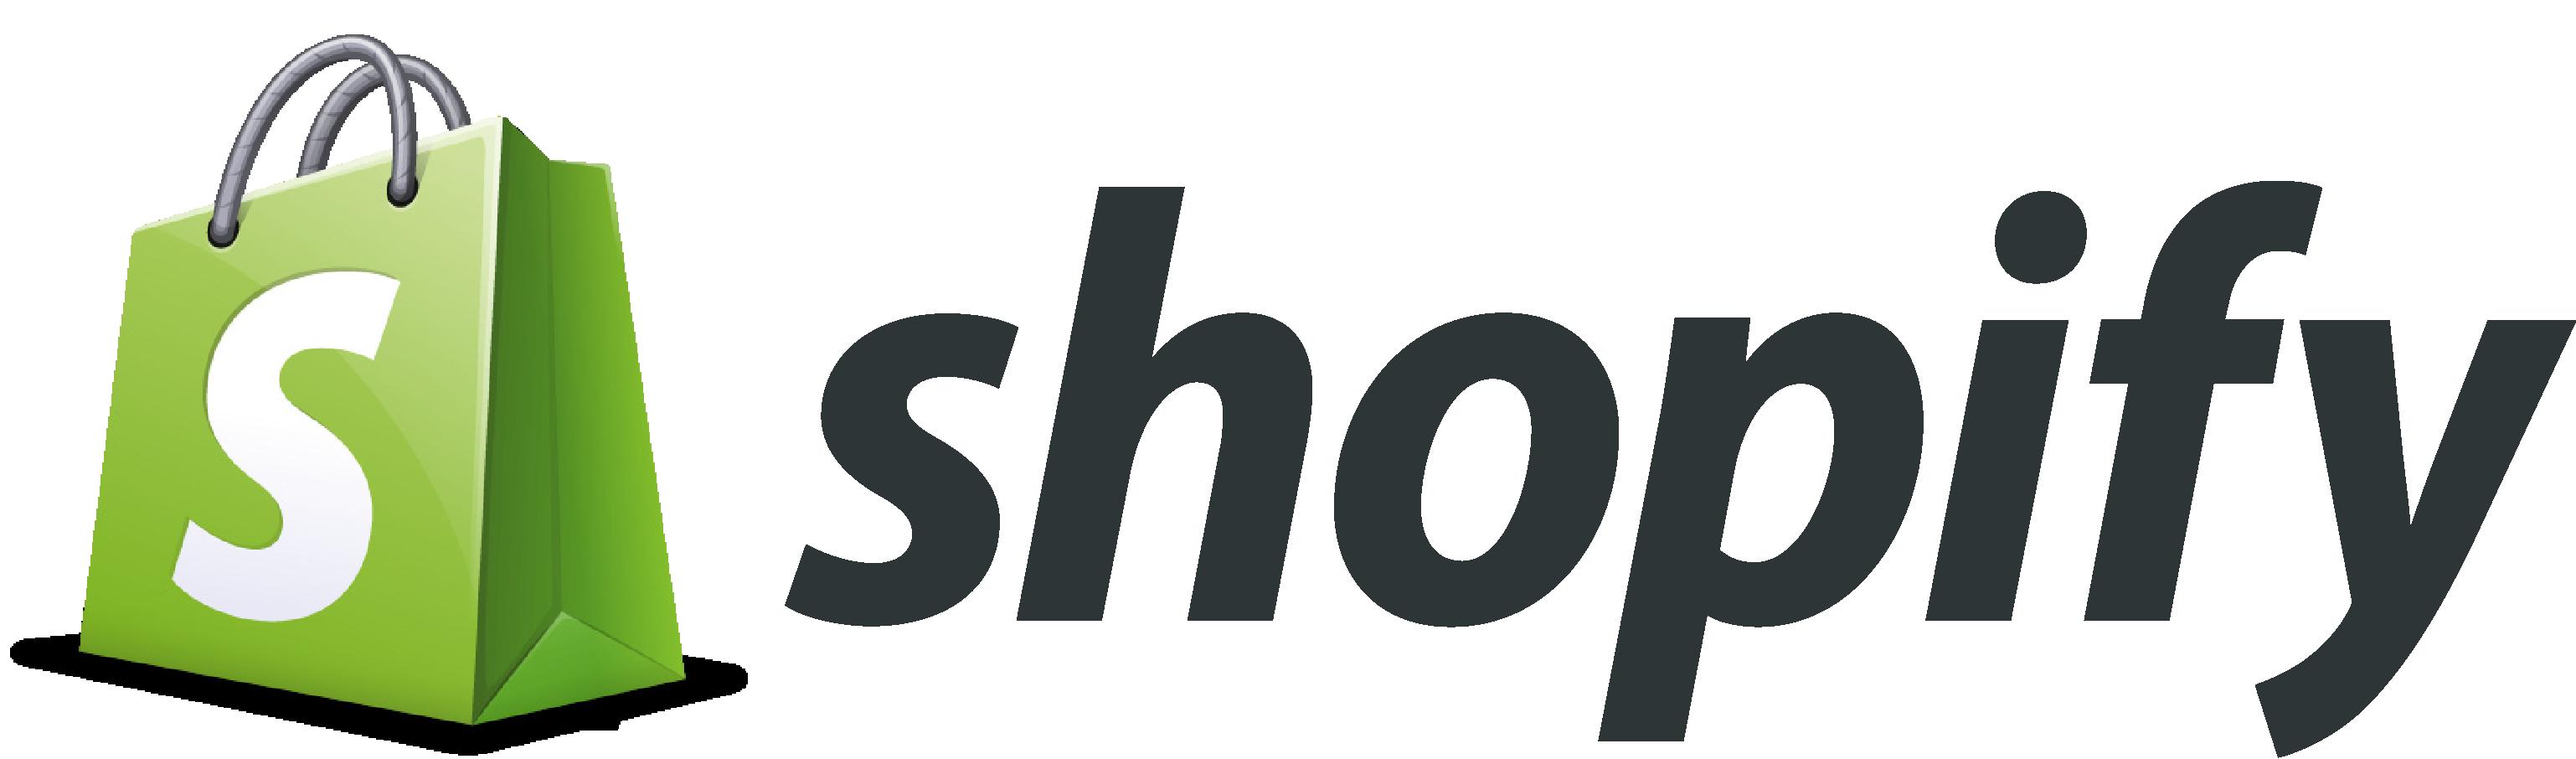 Adding a Shopify Buy Button.